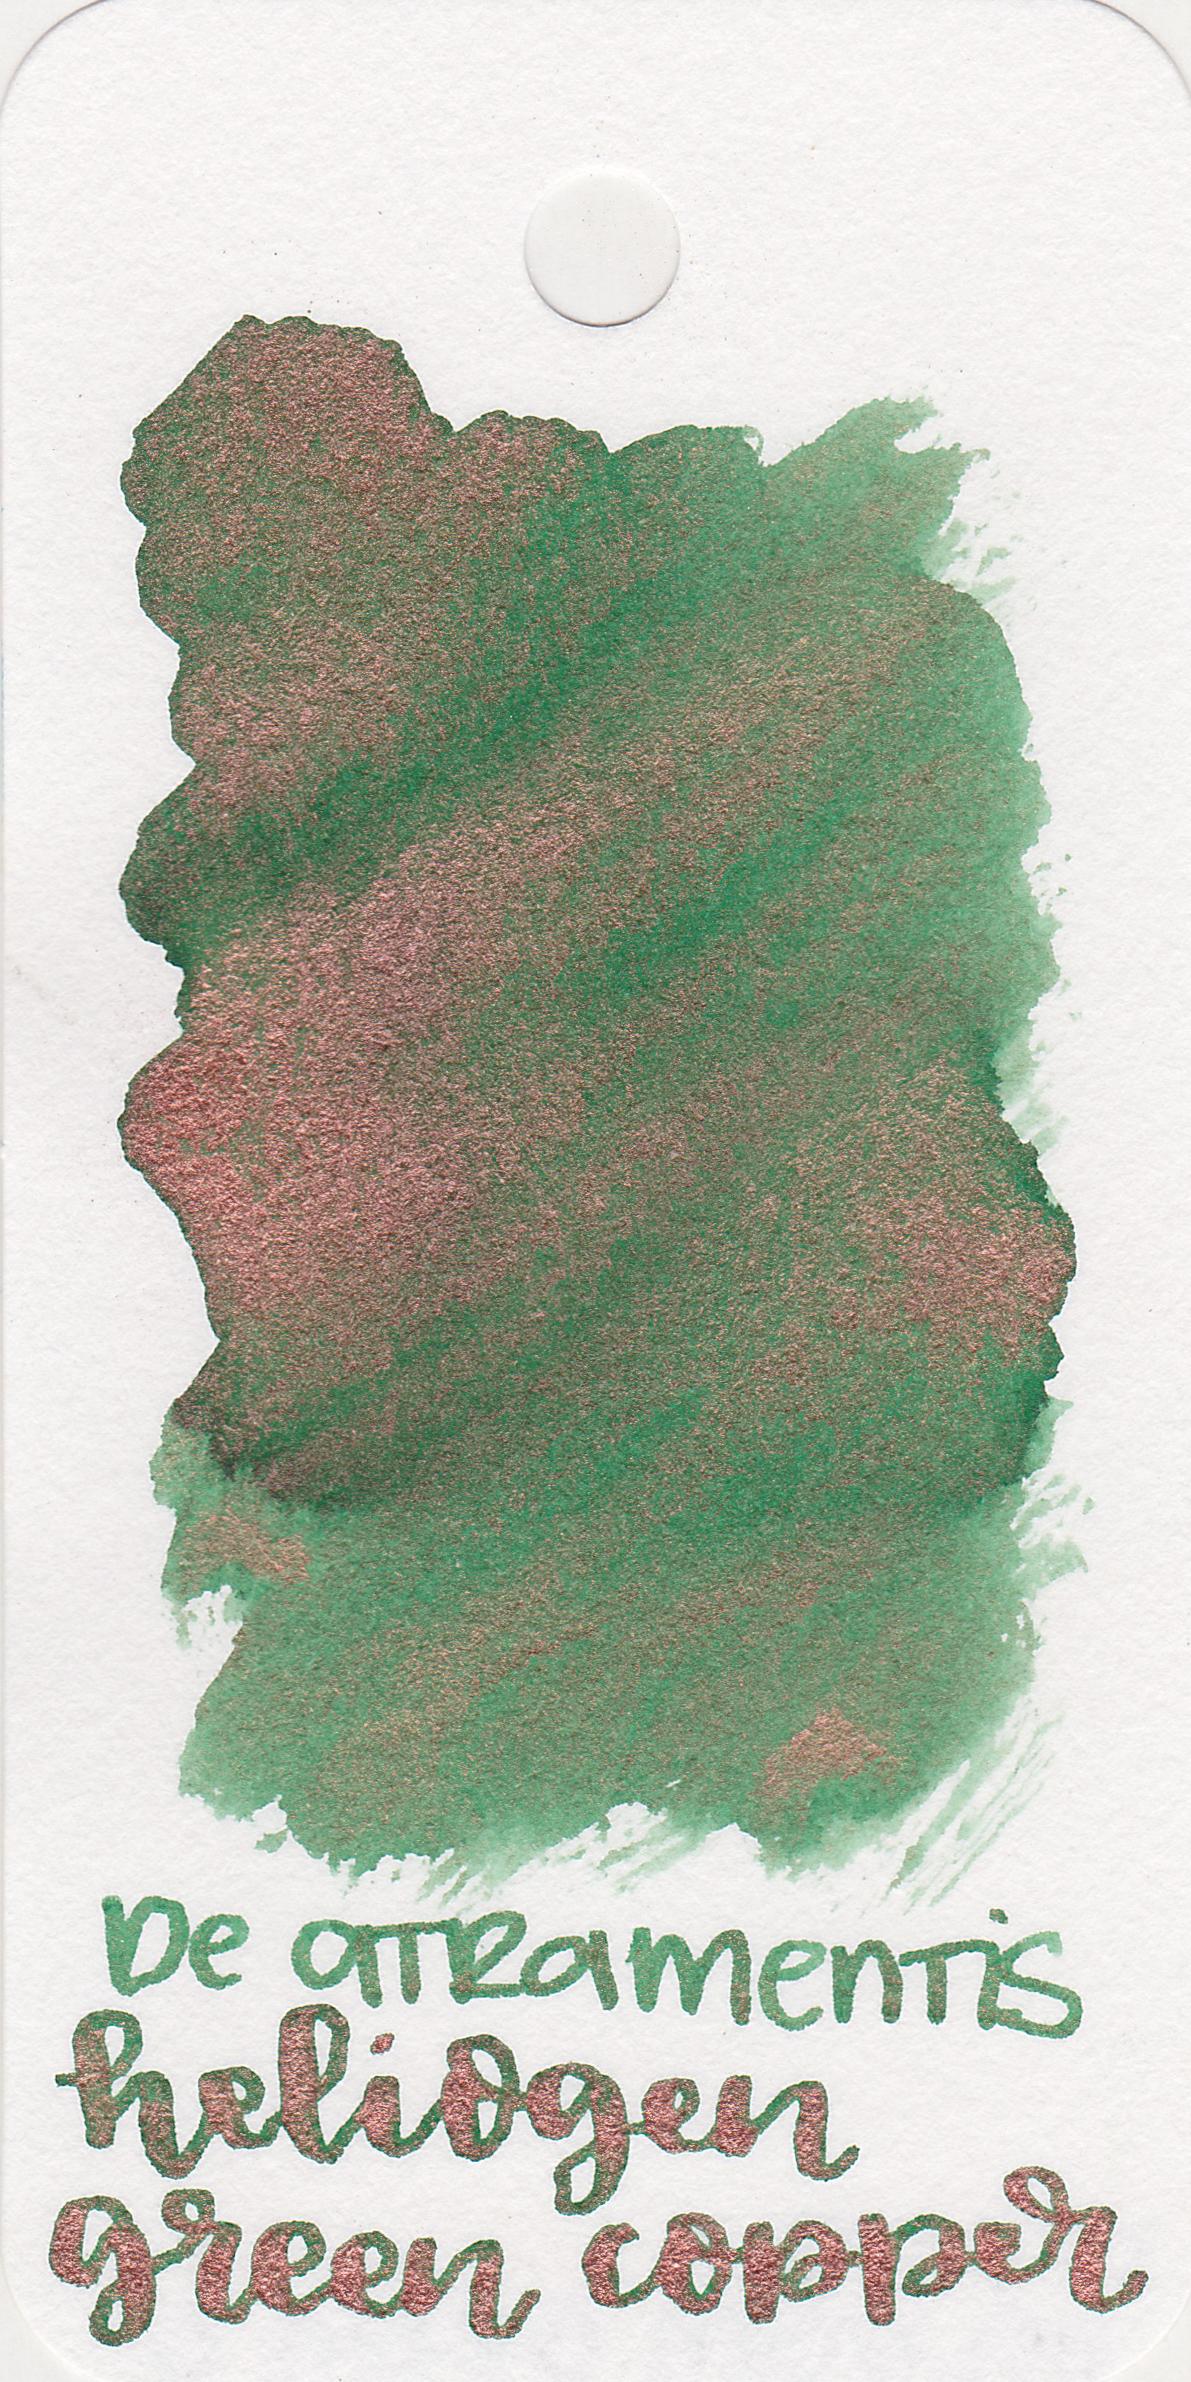 da-heliogen-green-copper-1.jpg